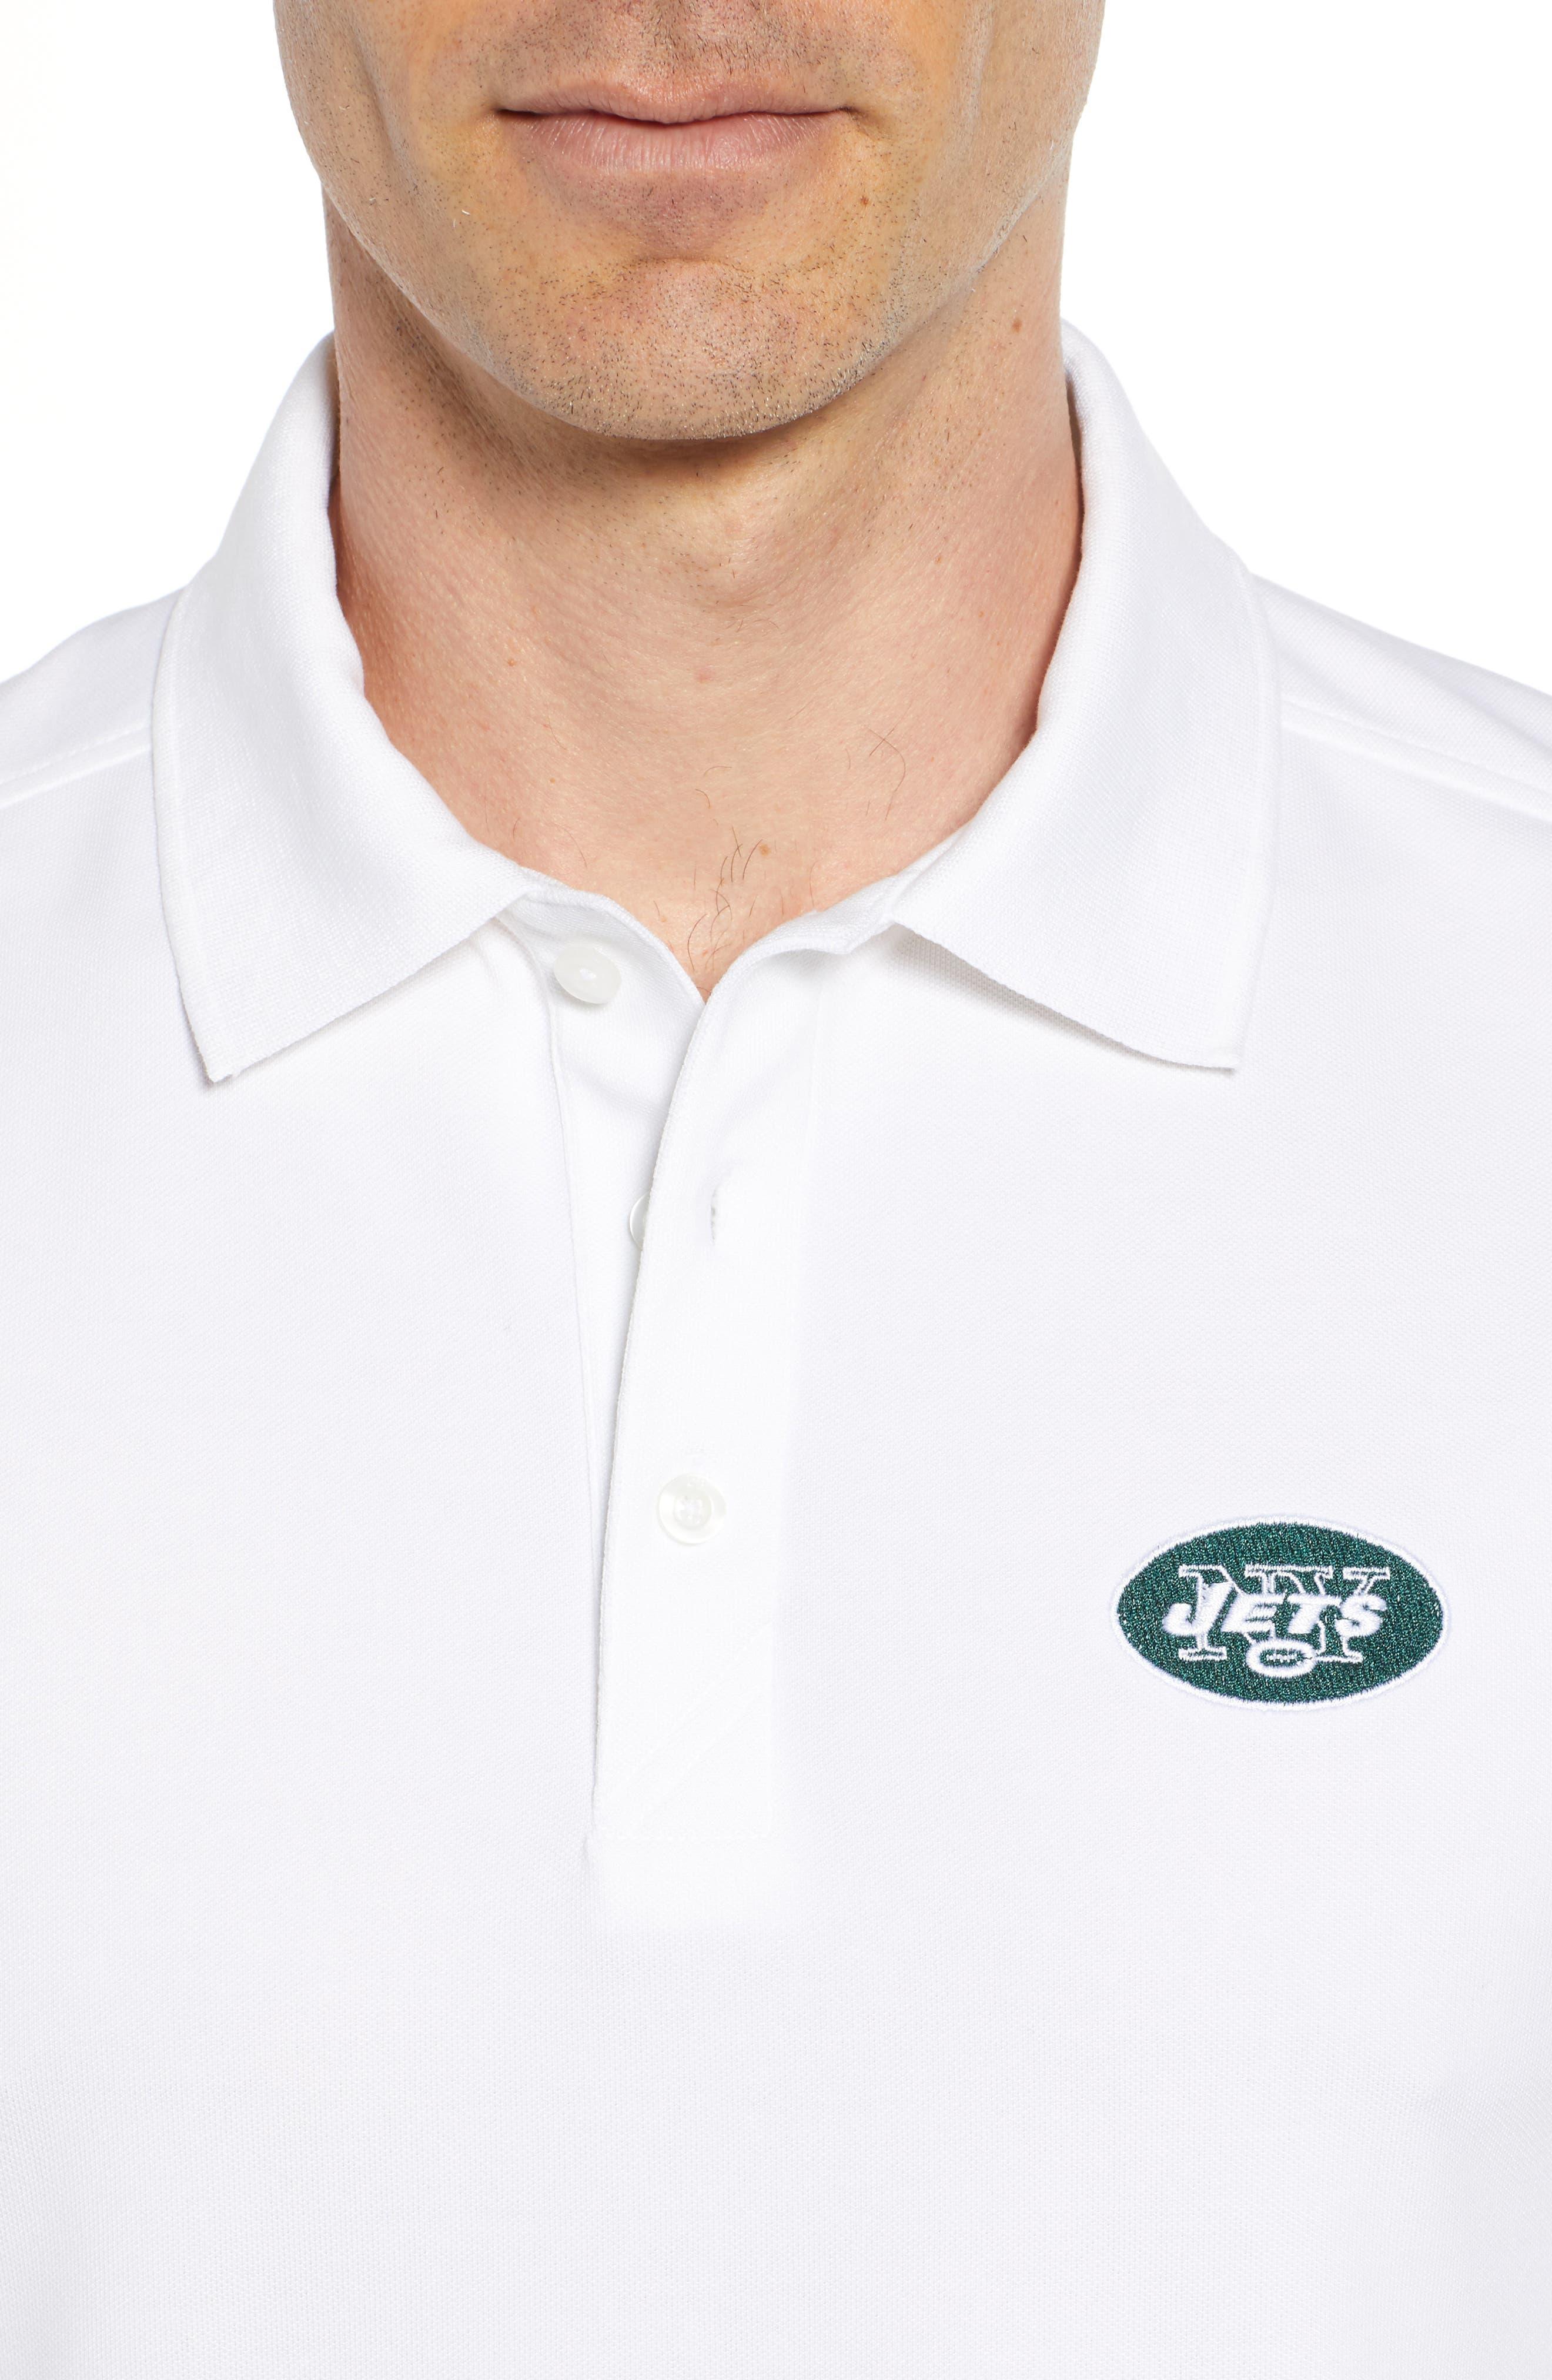 CUTTER & BUCK,                             New York Jets - Advantage Regular Fit DryTec Polo,                             Alternate thumbnail 4, color,                             100